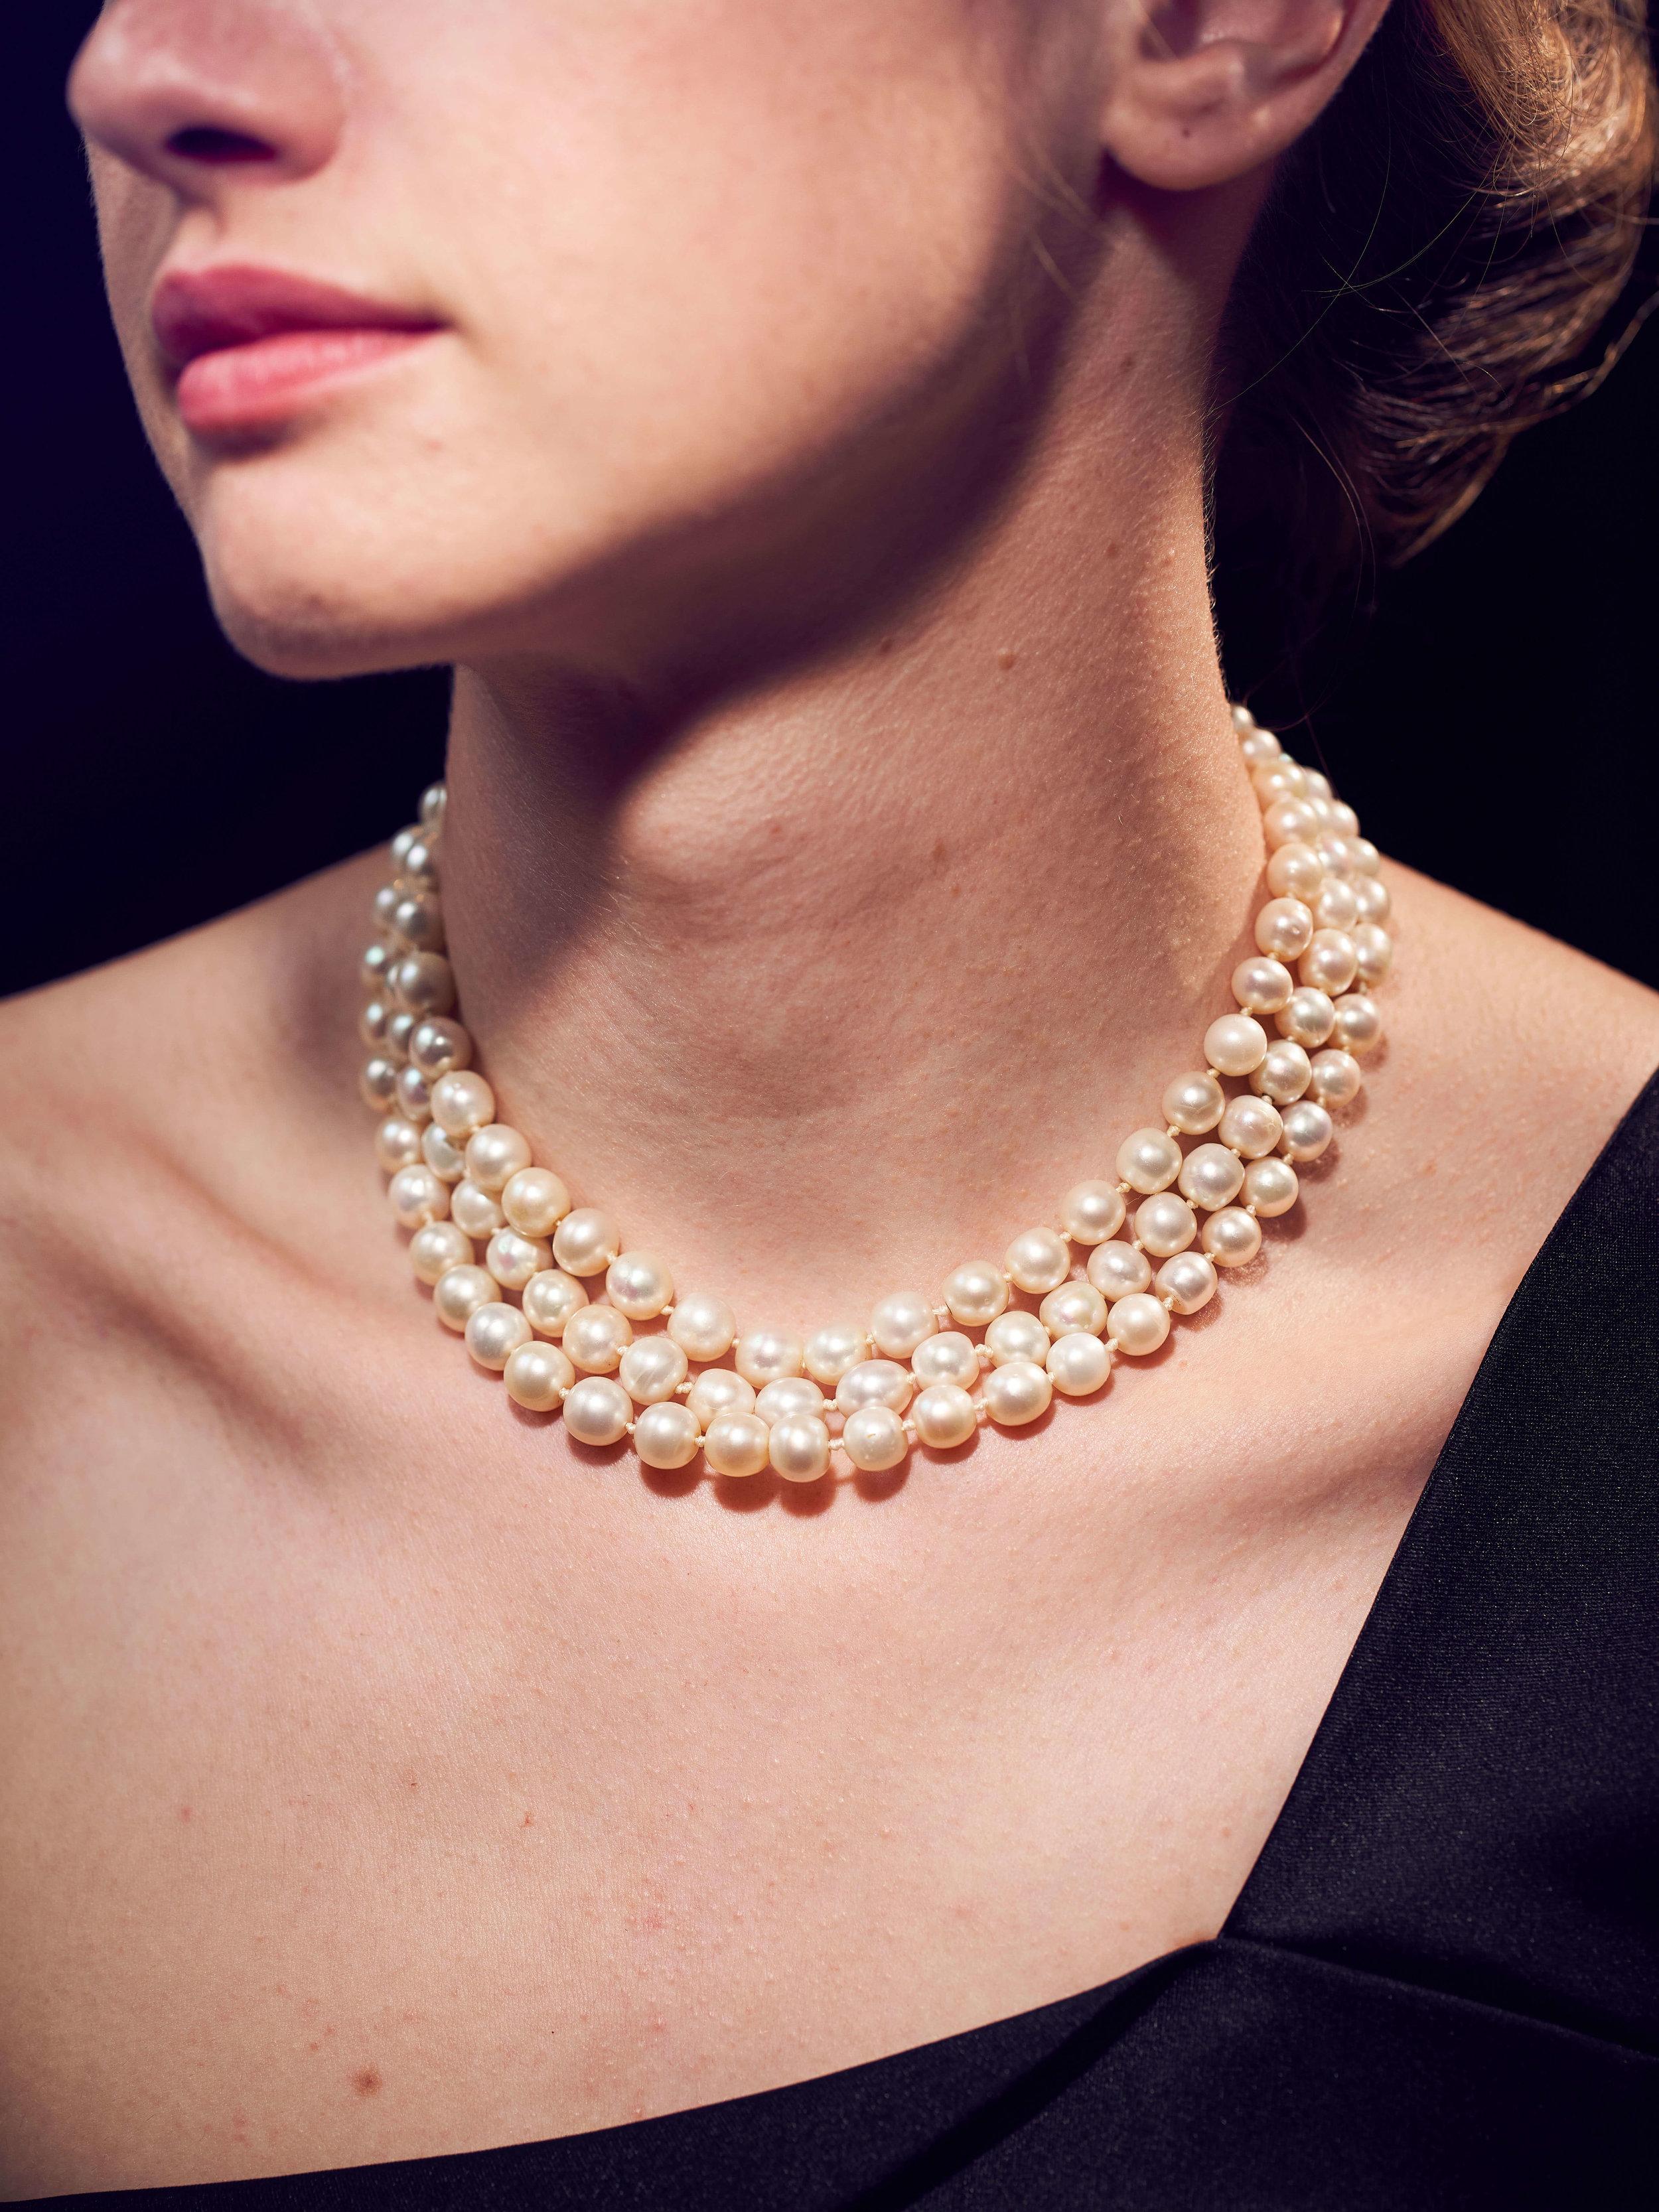 Sotheby's Royal Jewels 0016 - November 2018.JPG